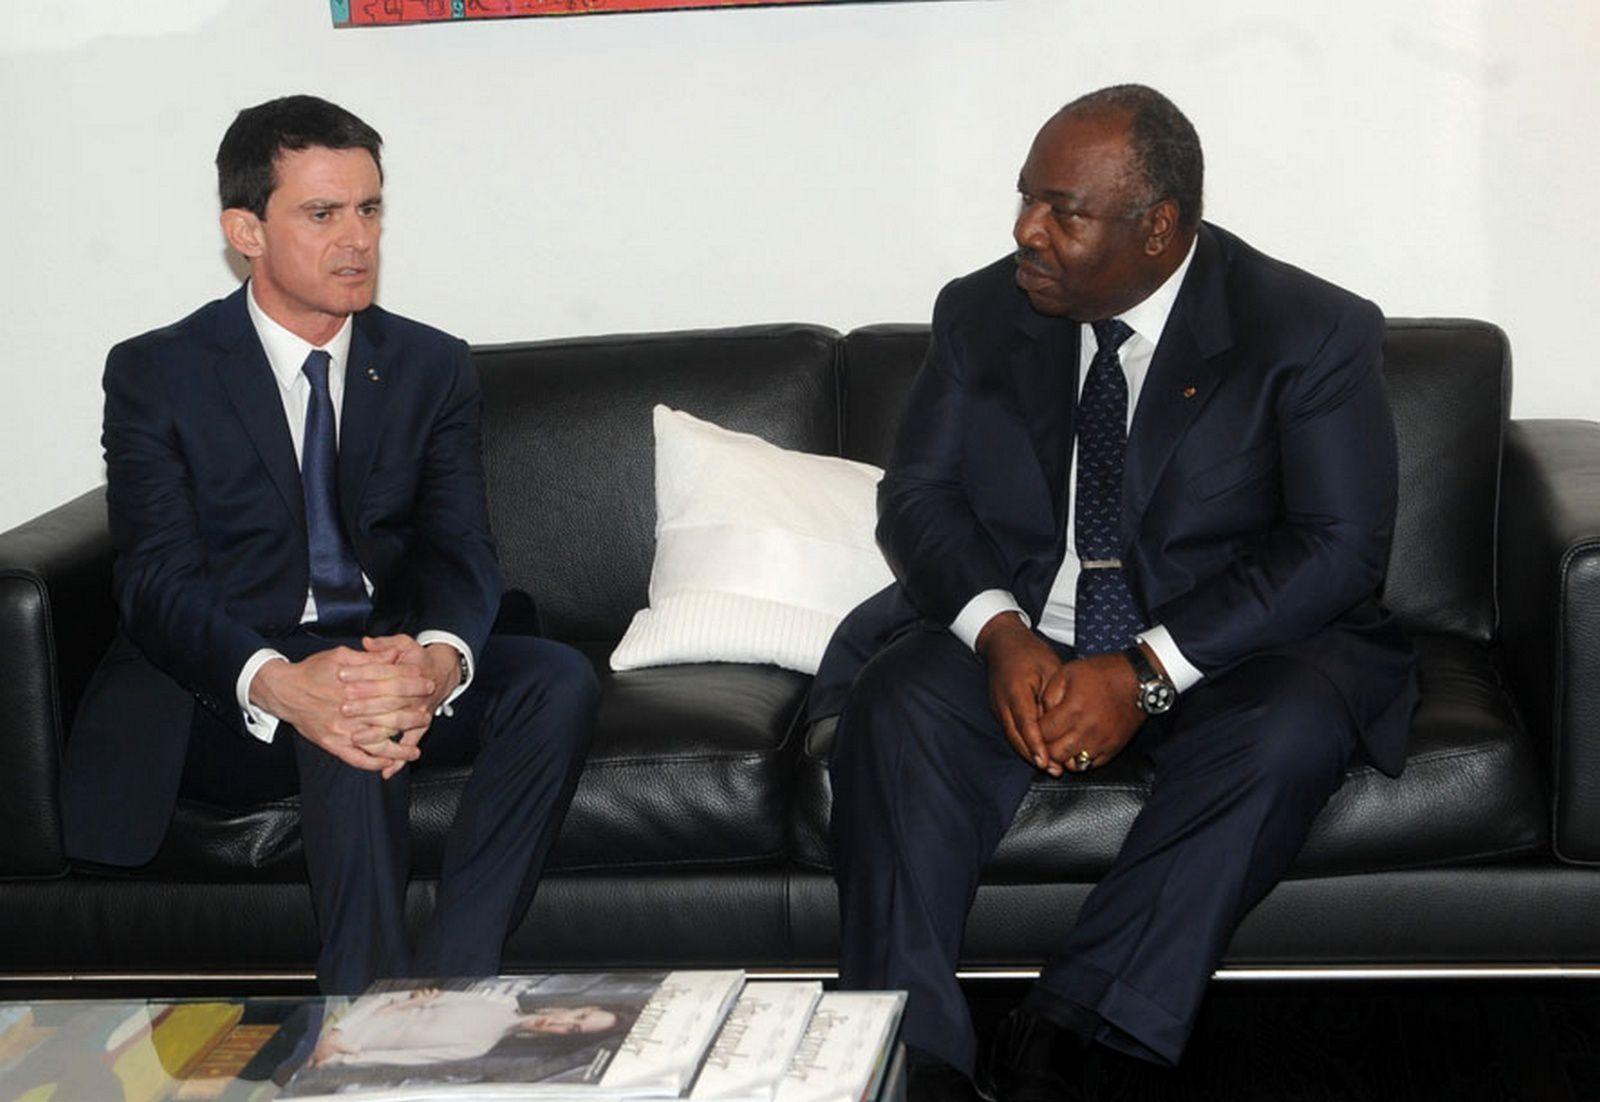 Entretien avec Manuel Valls